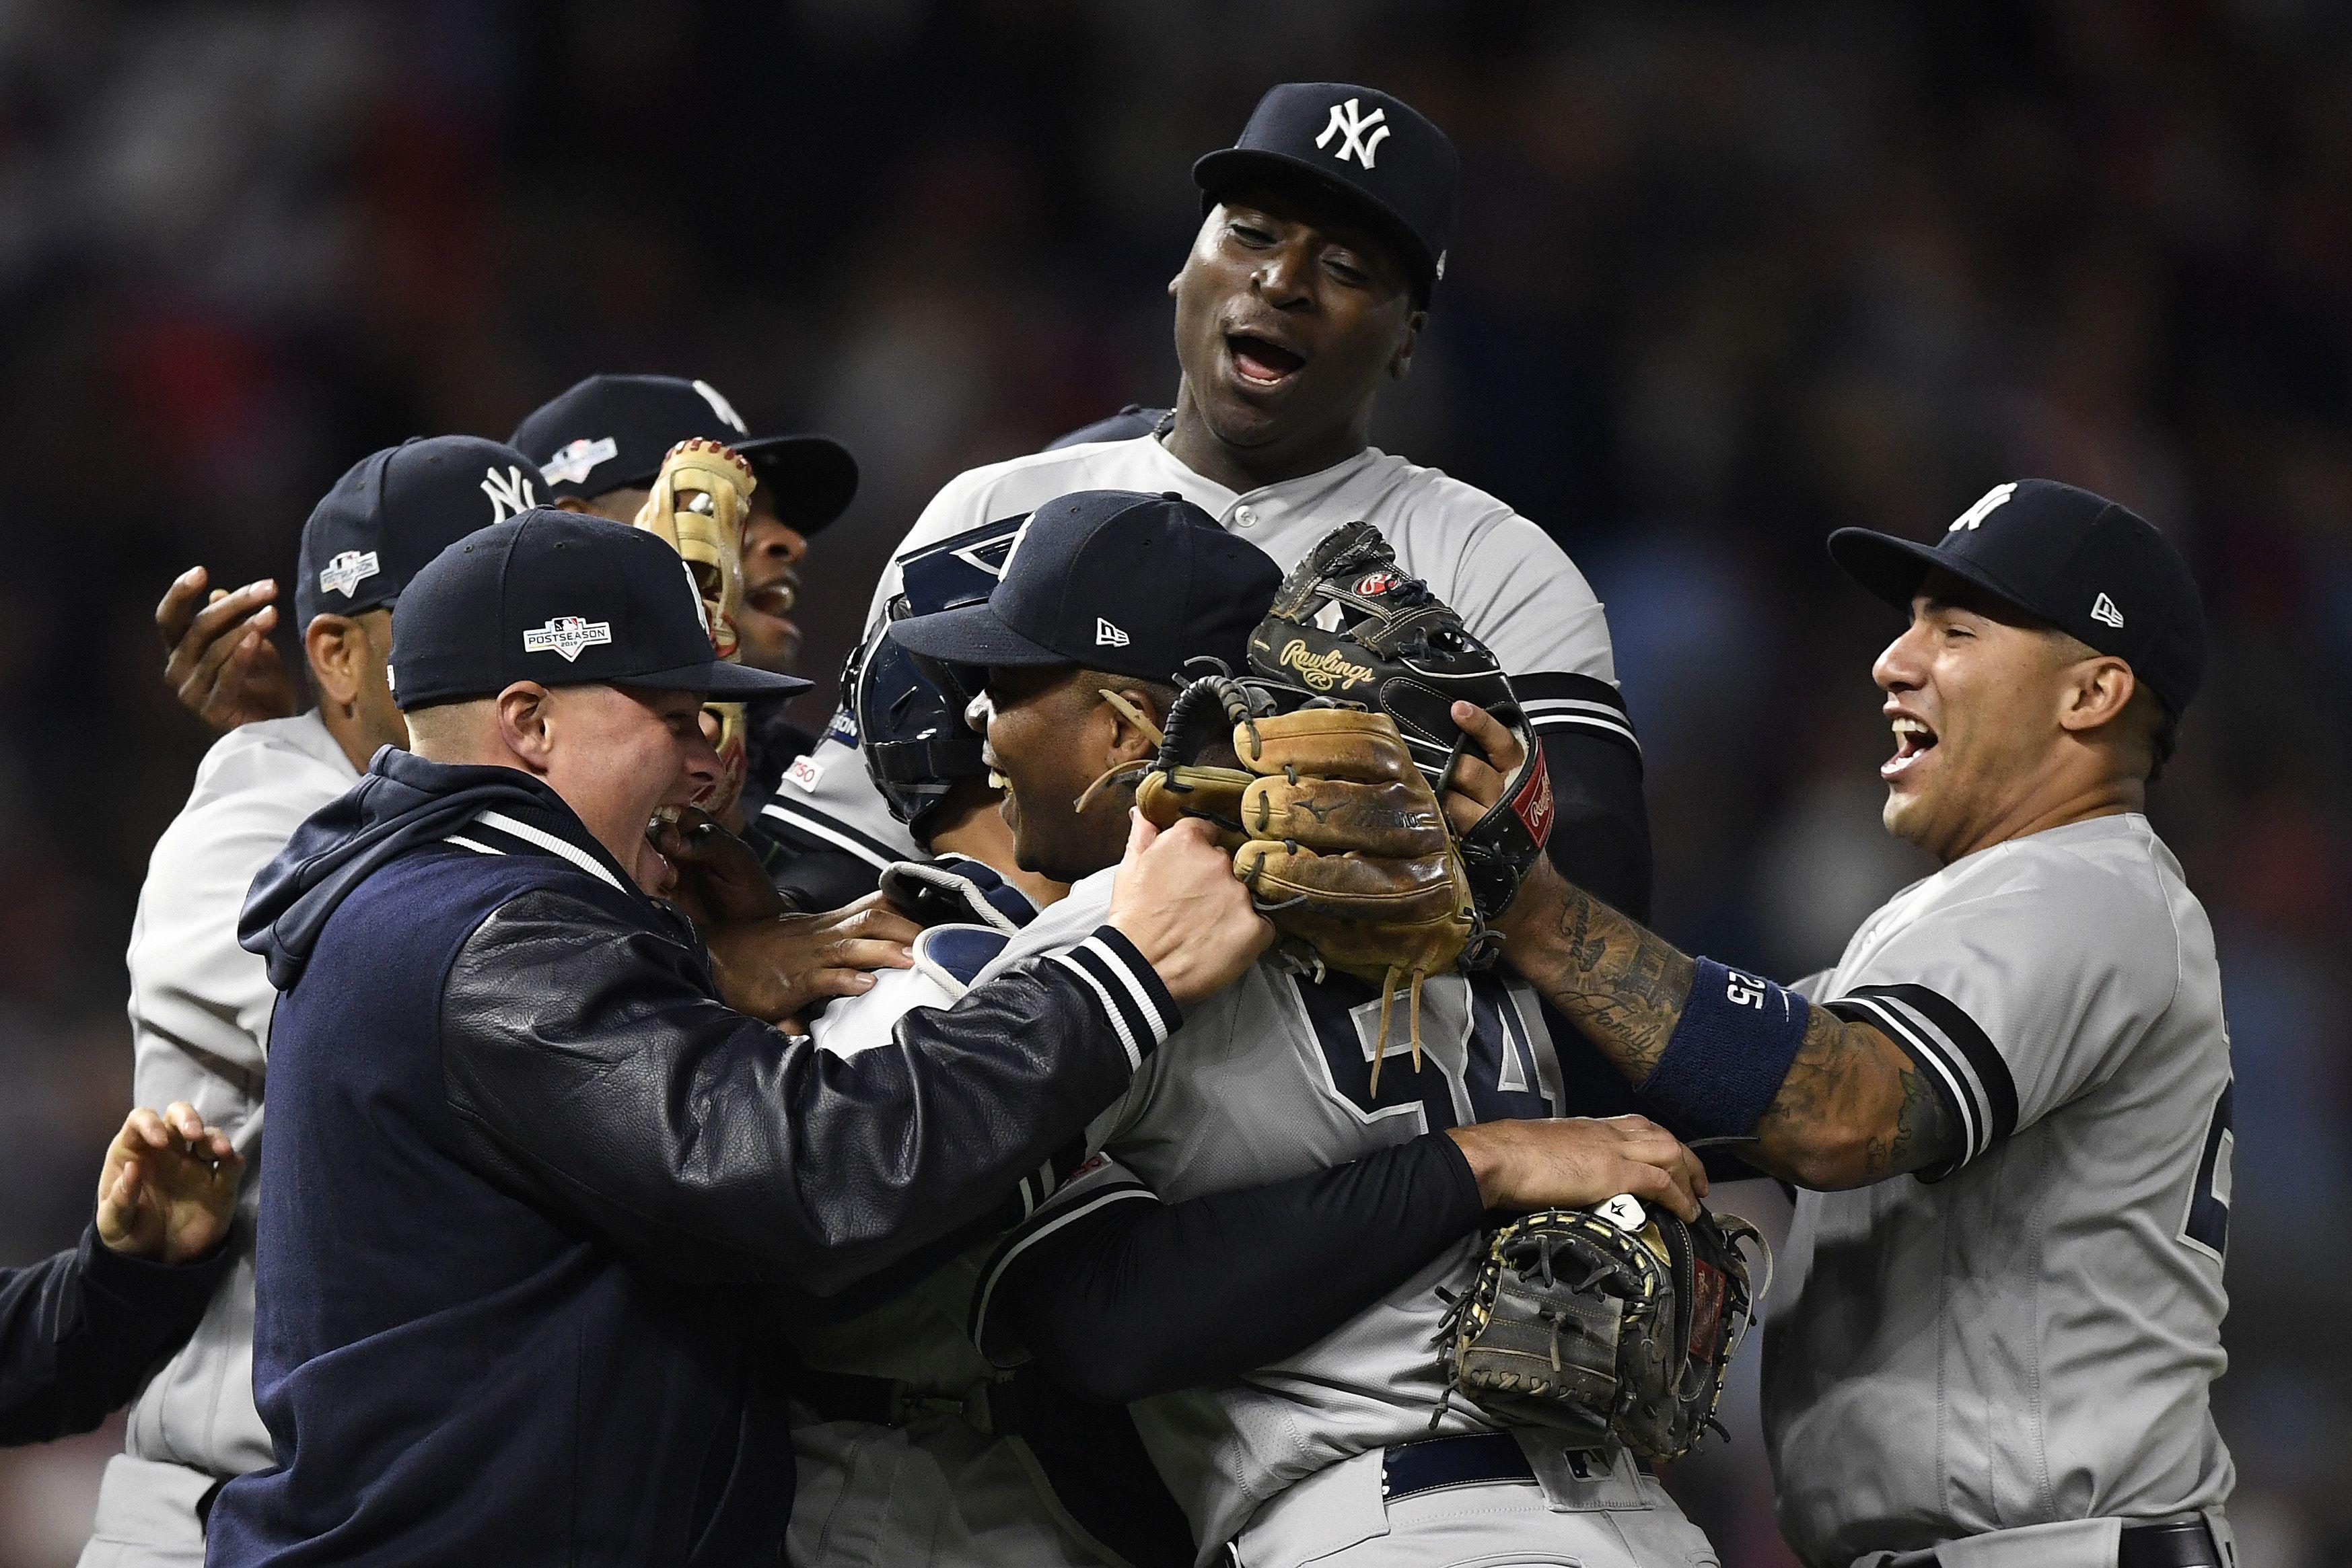 Yankees celebrating